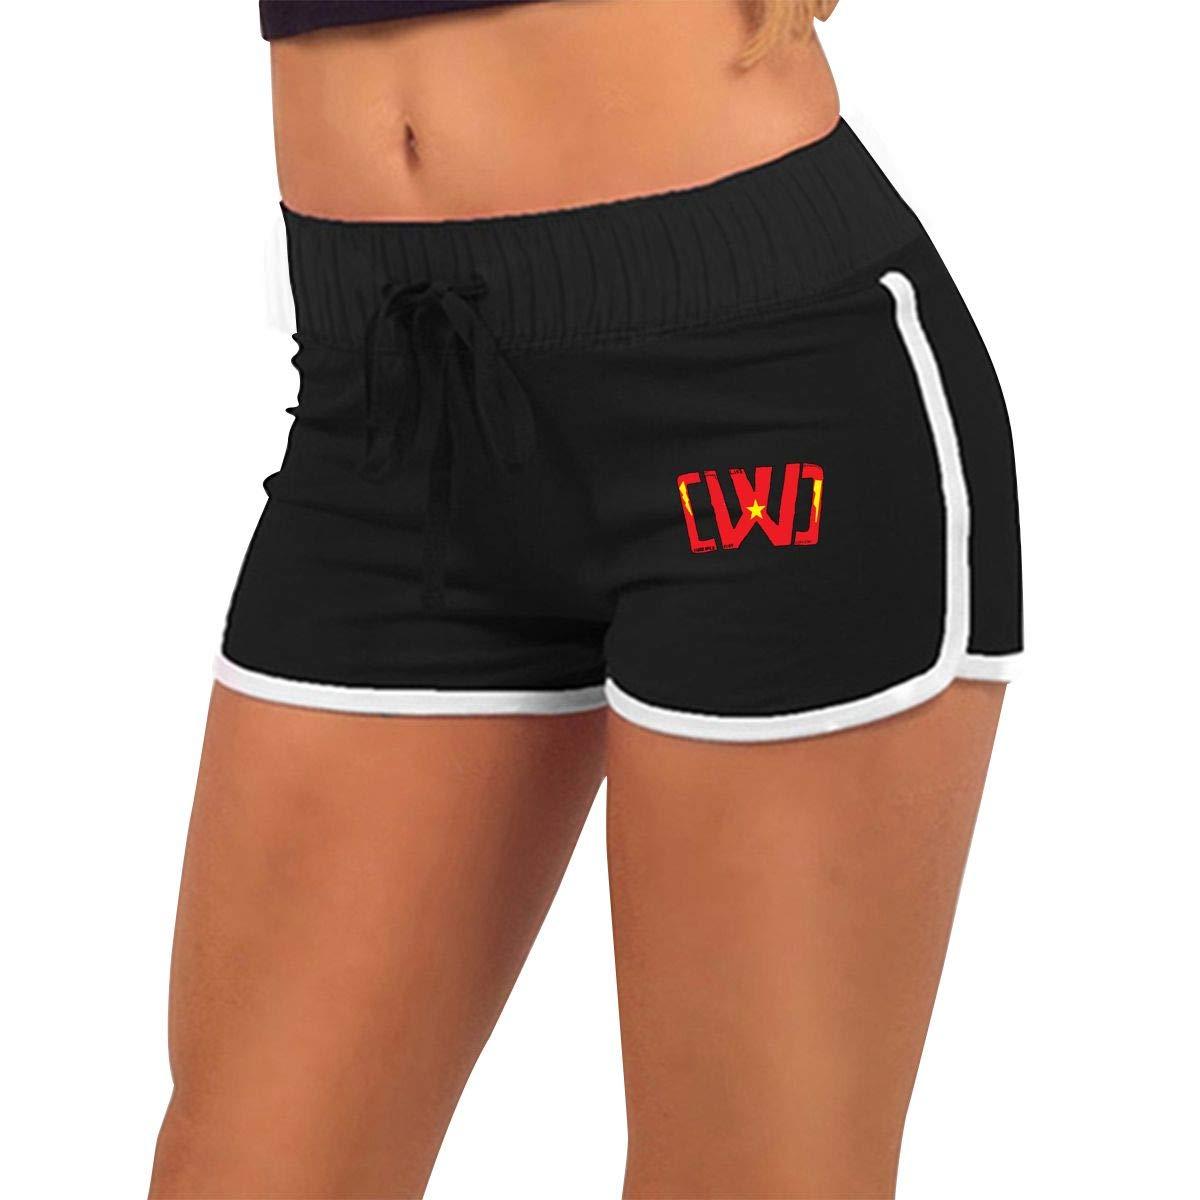 Gilmmer Women Elastic Low Waist Hot Pants CWC Chad Wild Clay ...